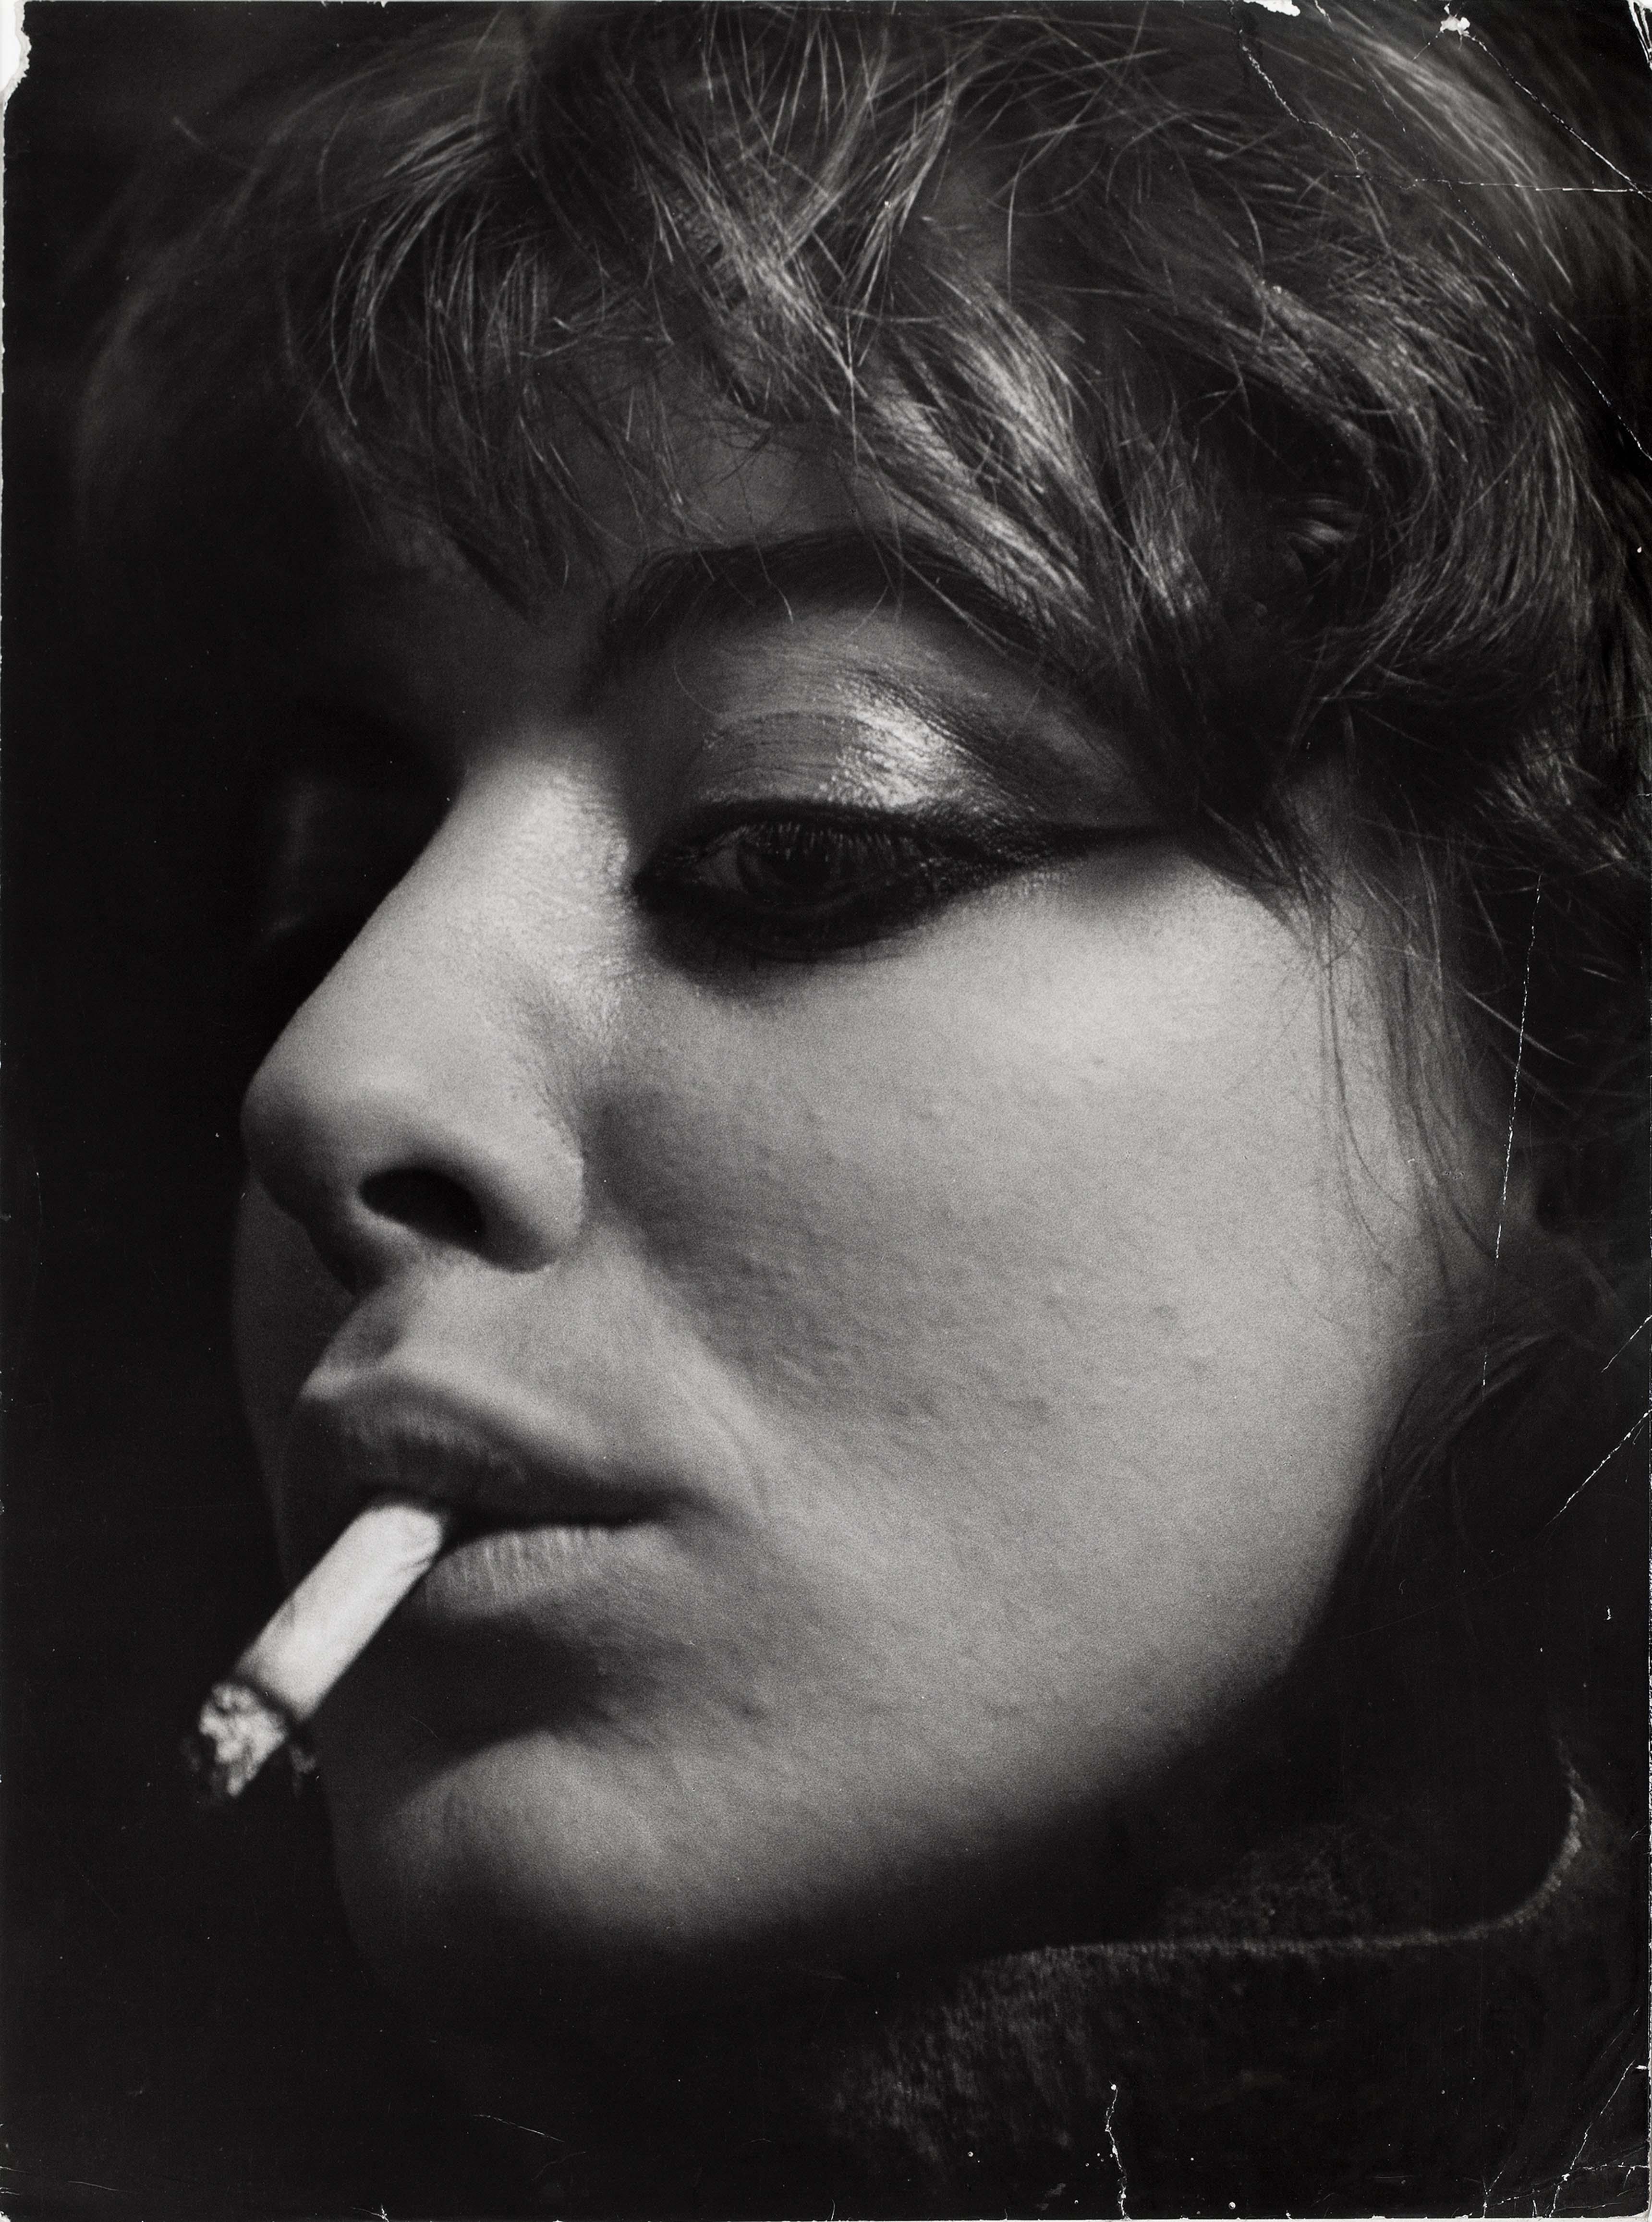 Ed van der Elsken, Vali Myers (Ann), Paris, 1953. Nederlands Fotomuseum Rotterdam © Ed van der Elsken / Collection Stedelijk Museum Amsterdam